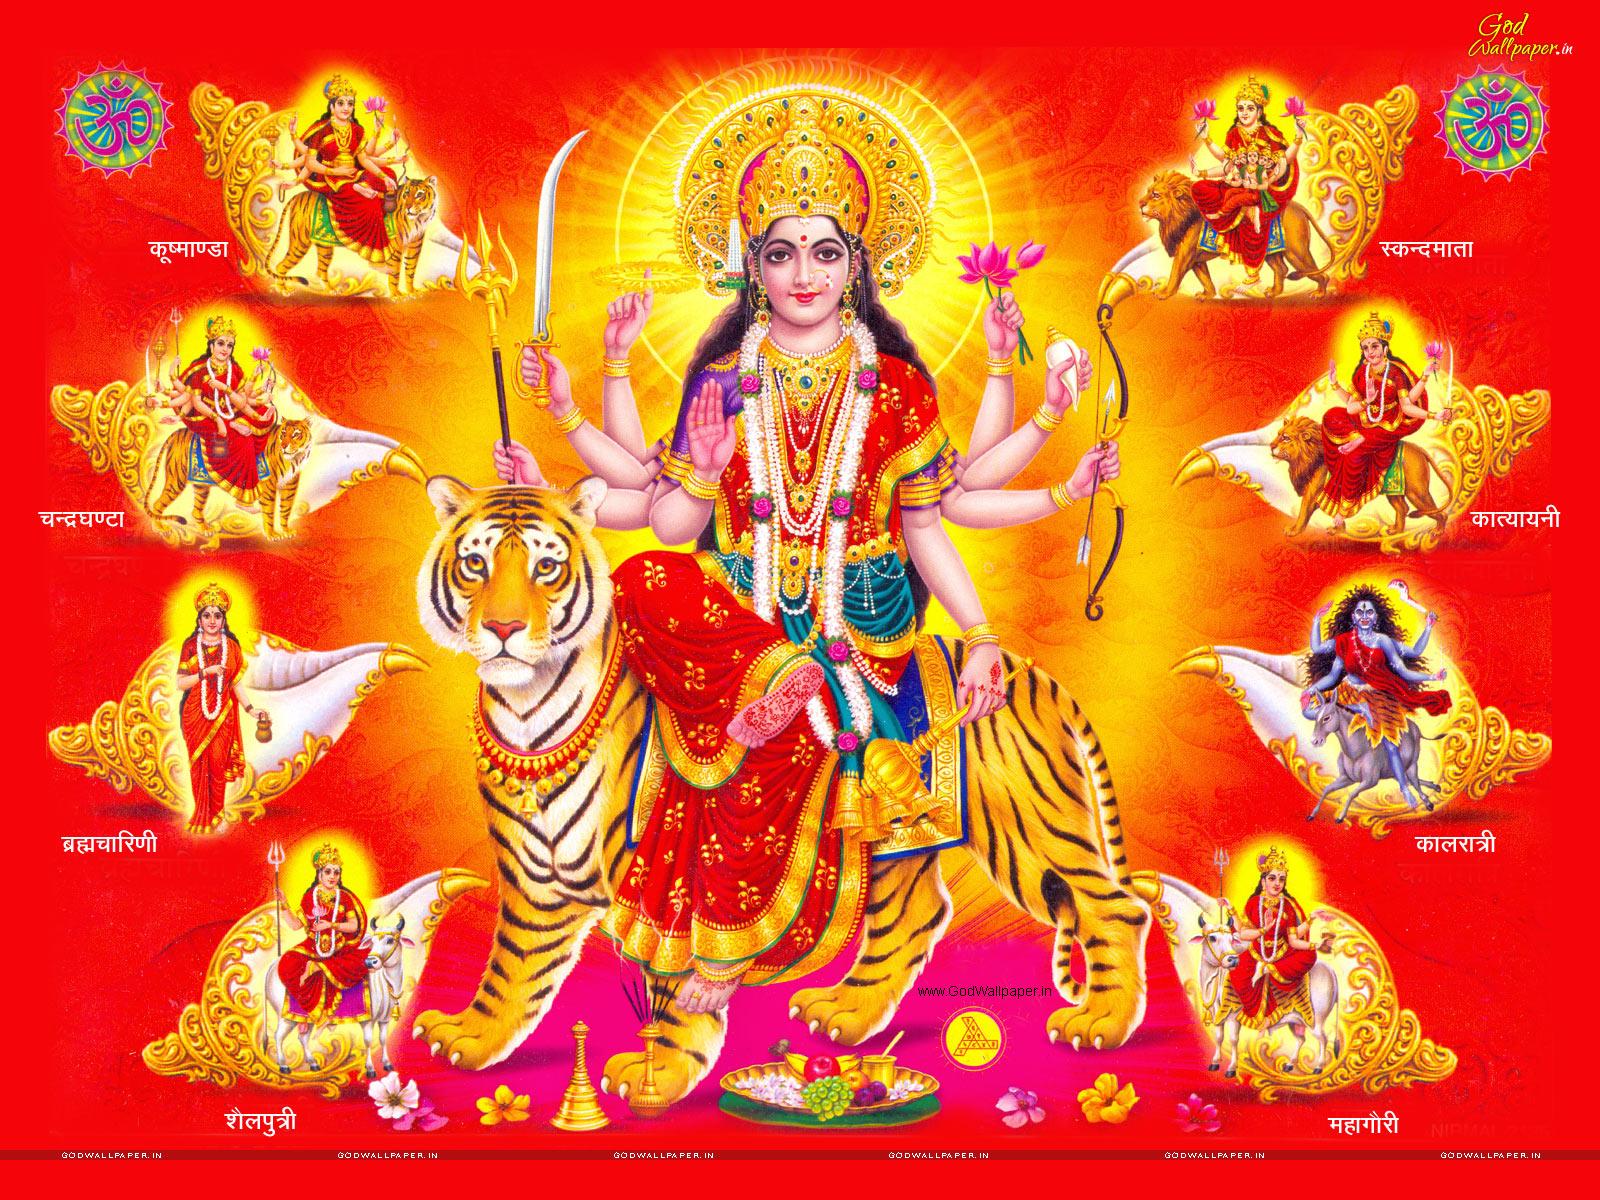 Nav Durga Hd Wallpaper Free Download For Pc